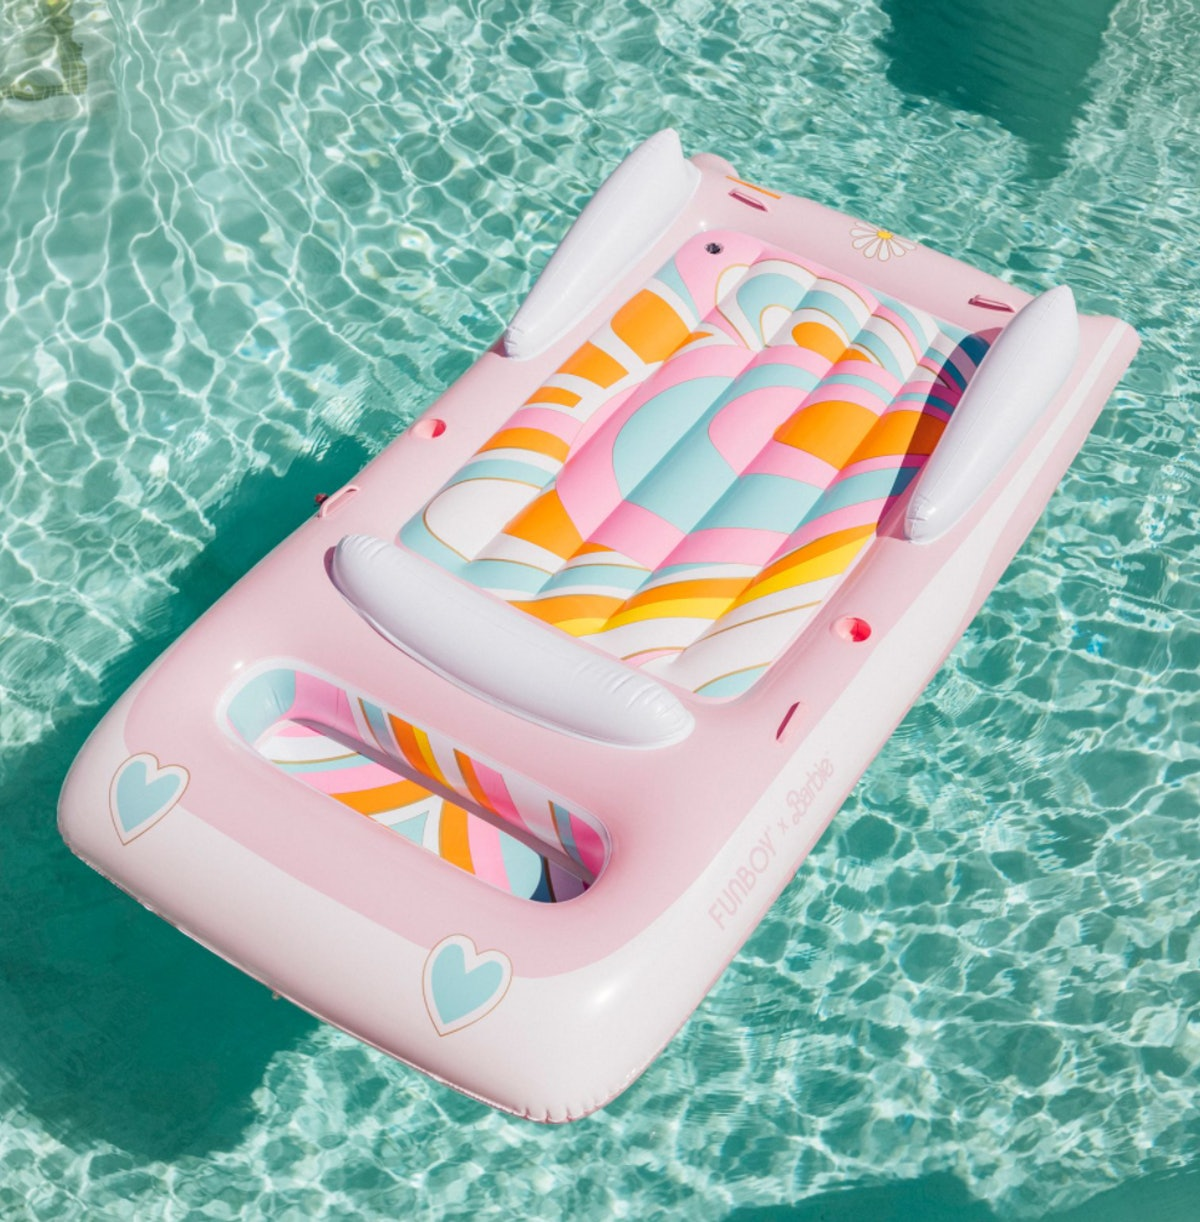 FUNBOY x Vintage Malibu Convertible Float